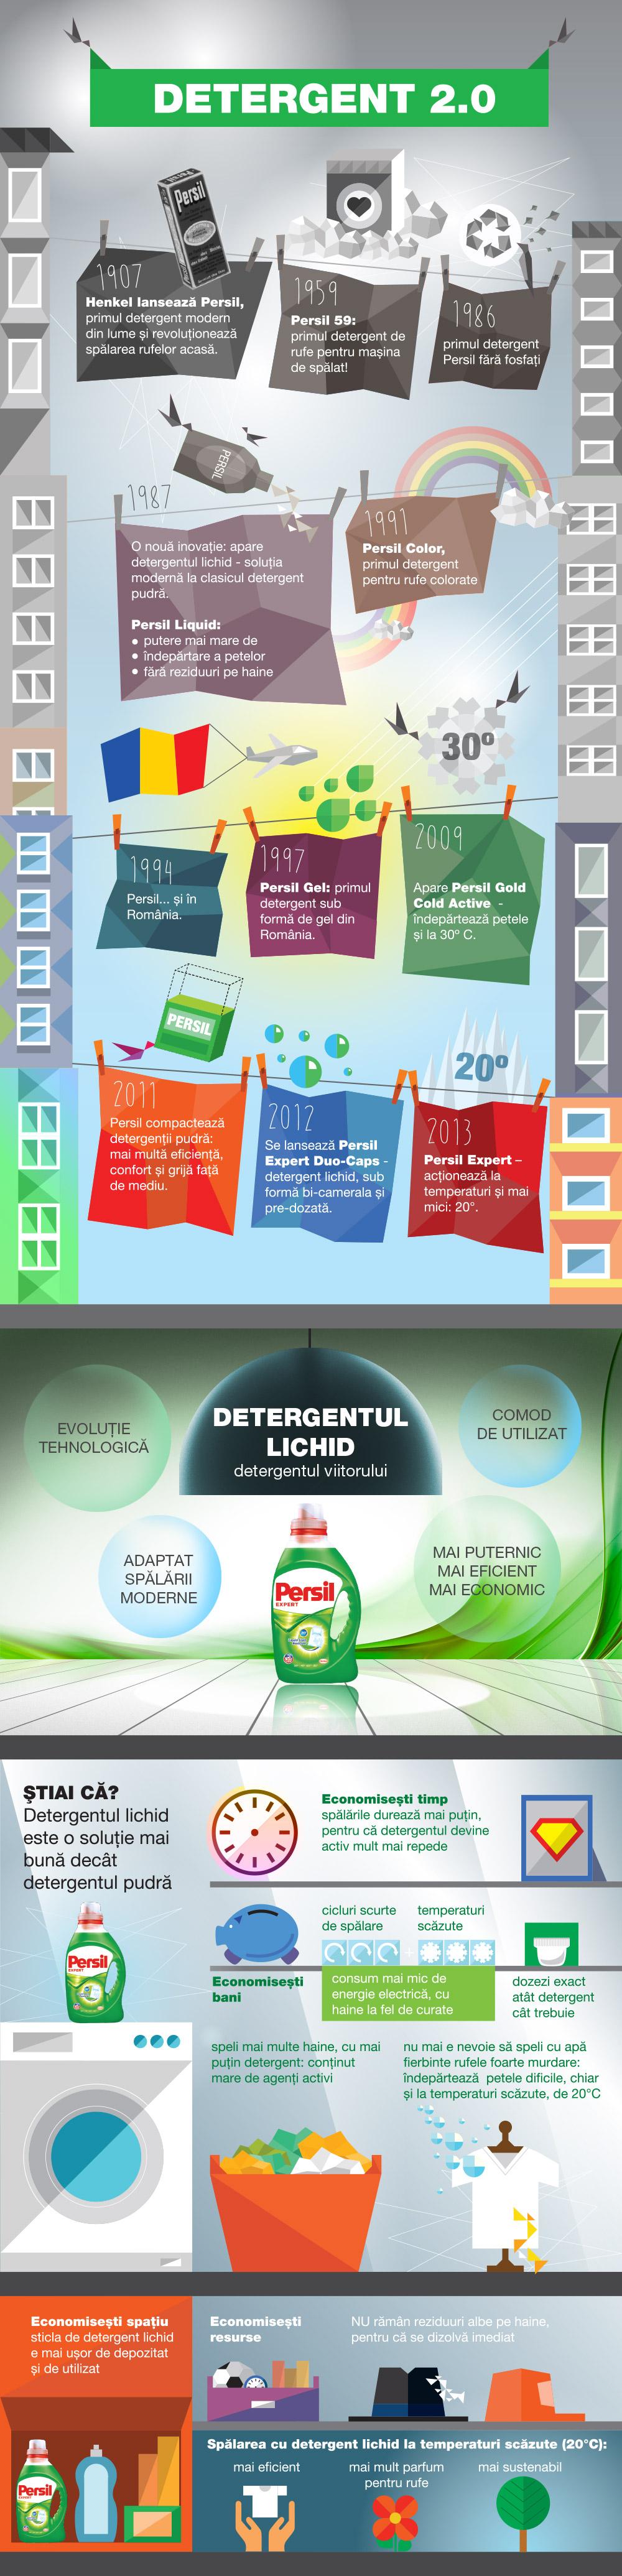 infografic-persil_detergent-2-0